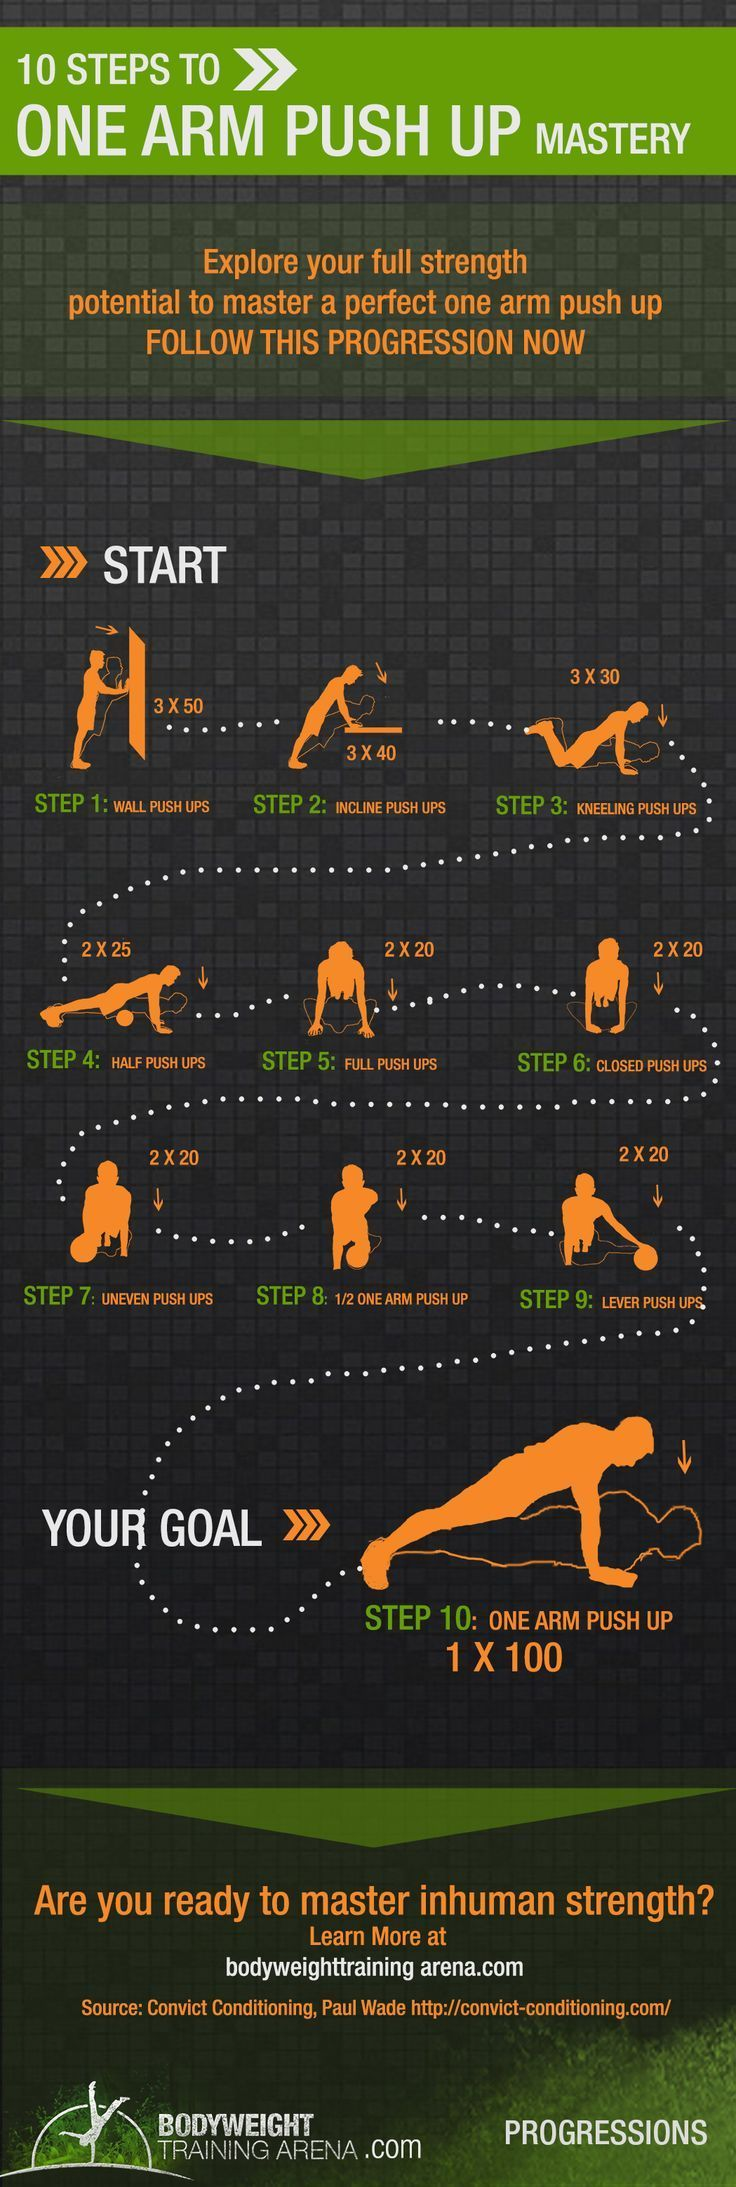 One Arm Push Up Progression – #Arm #Progression #Push #steps